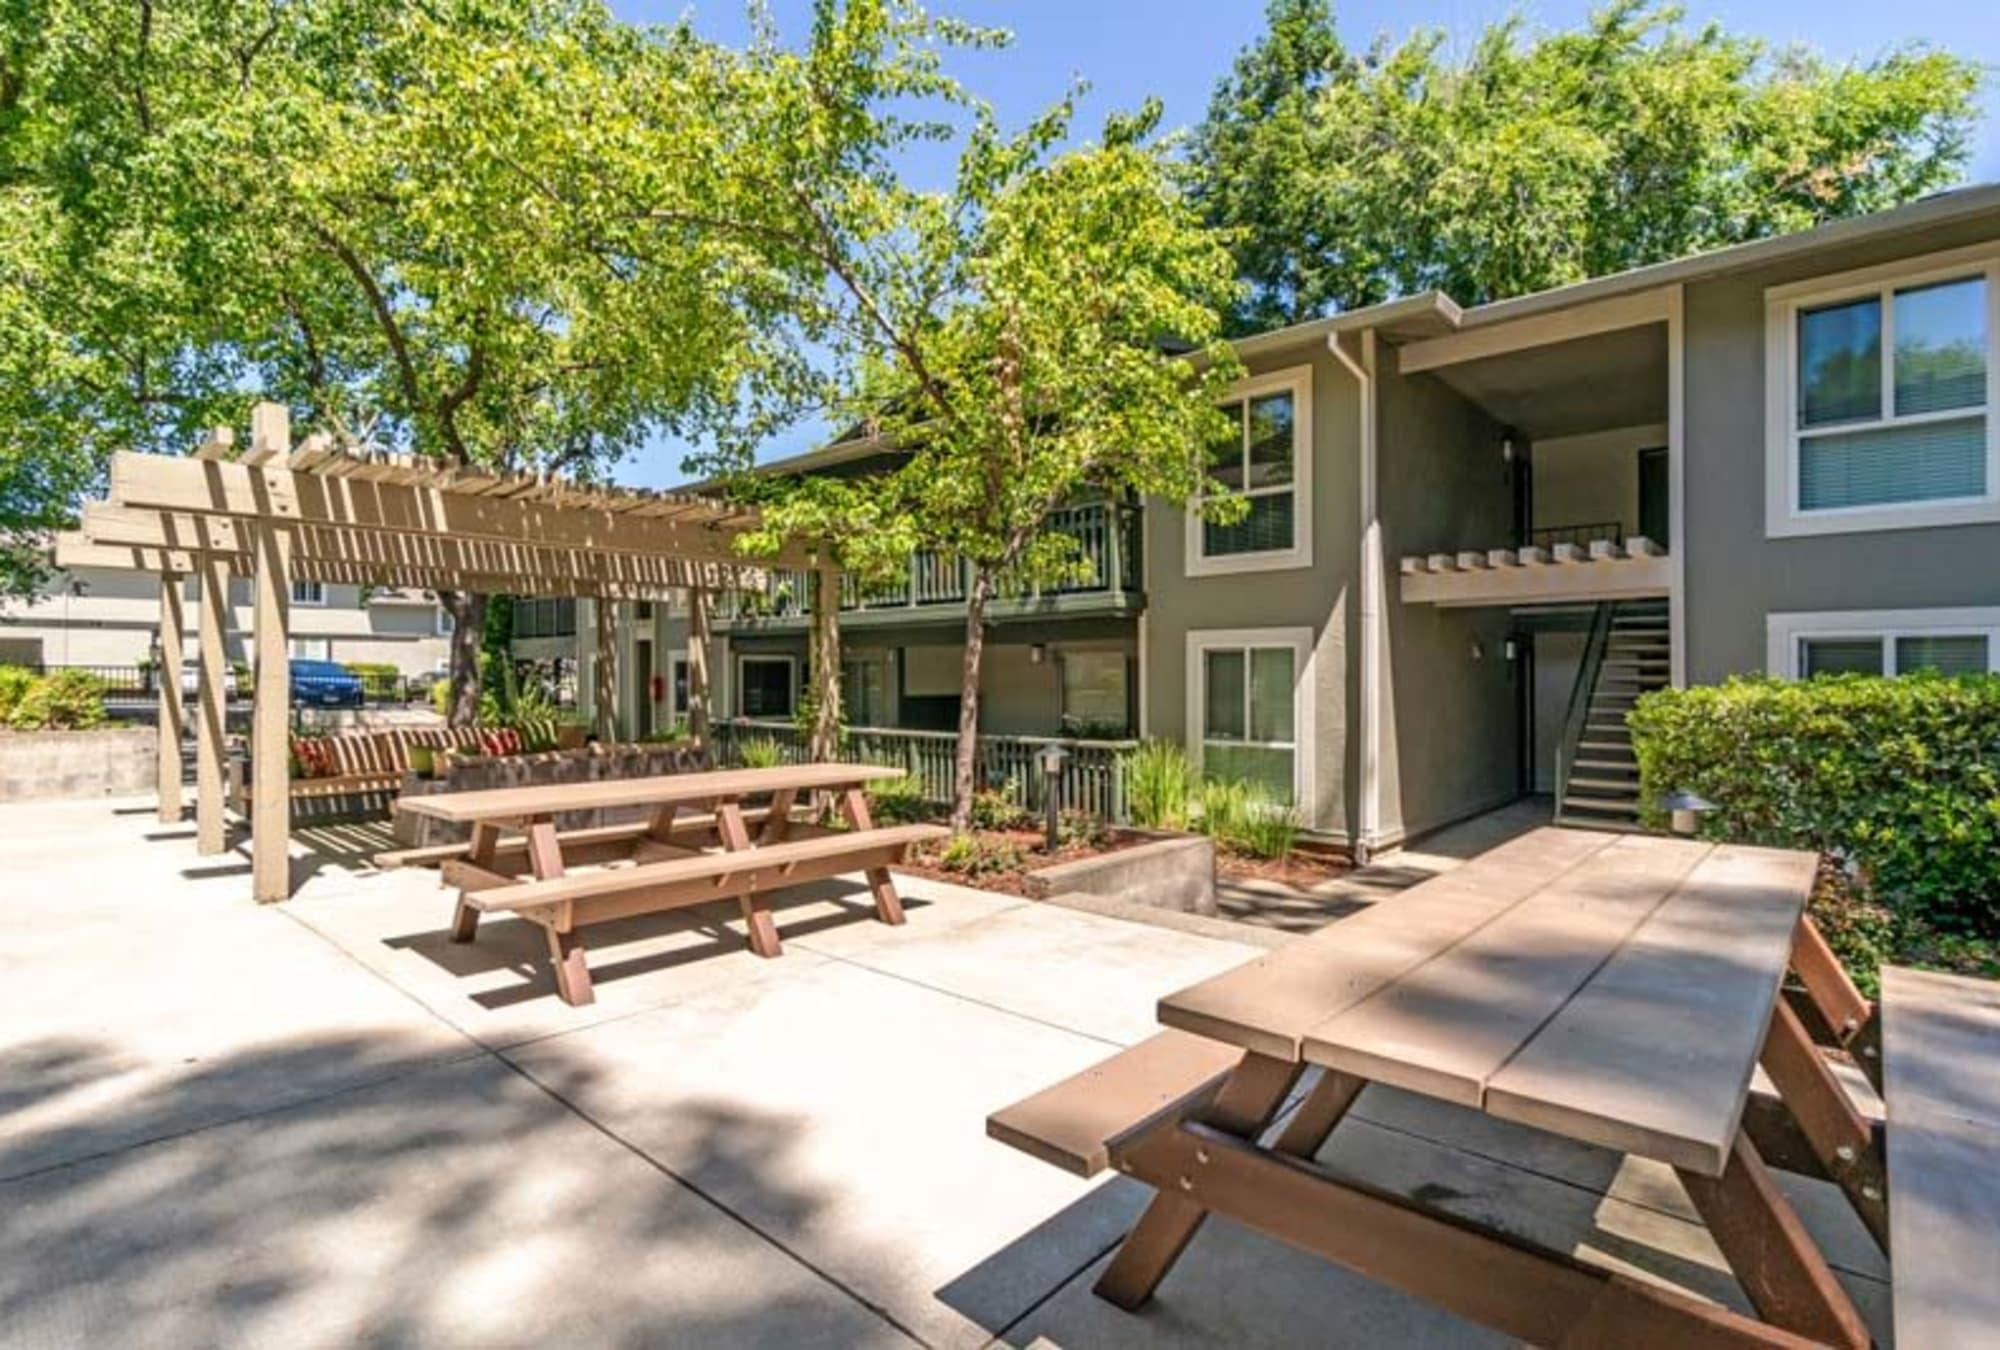 Picnic area at Pleasanton Glen Apartment Homes in Pleasanton, California